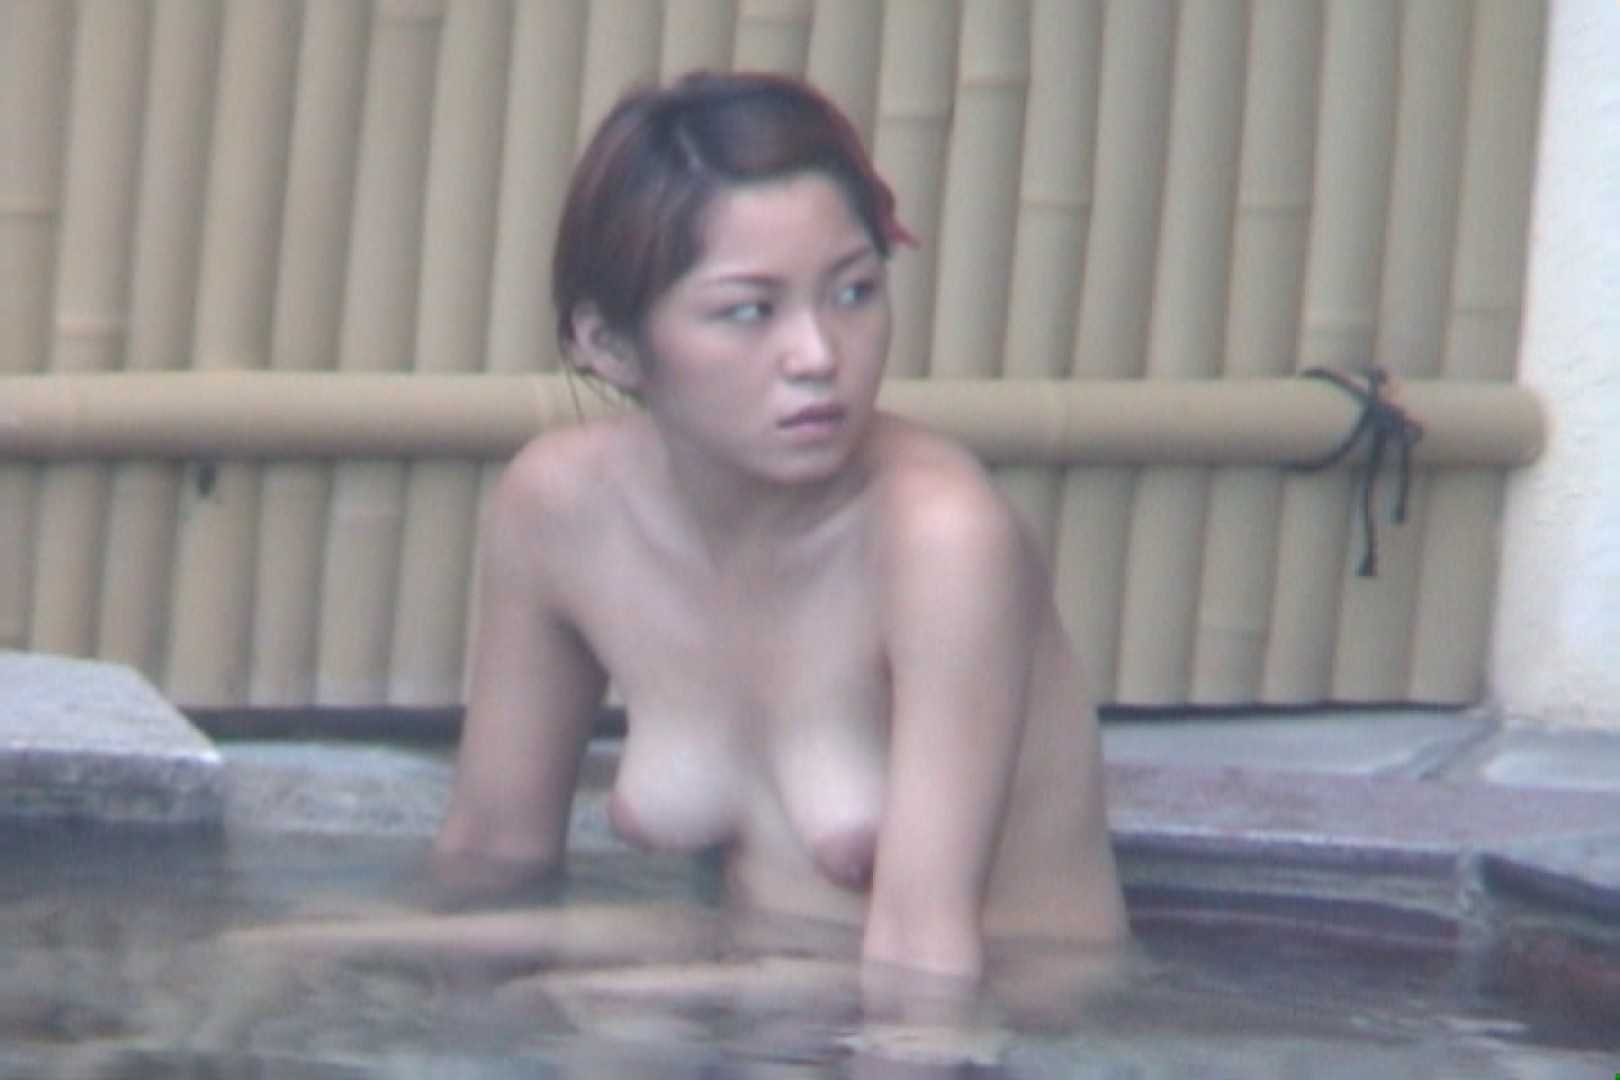 Aquaな露天風呂Vol.574 0  81連発 40